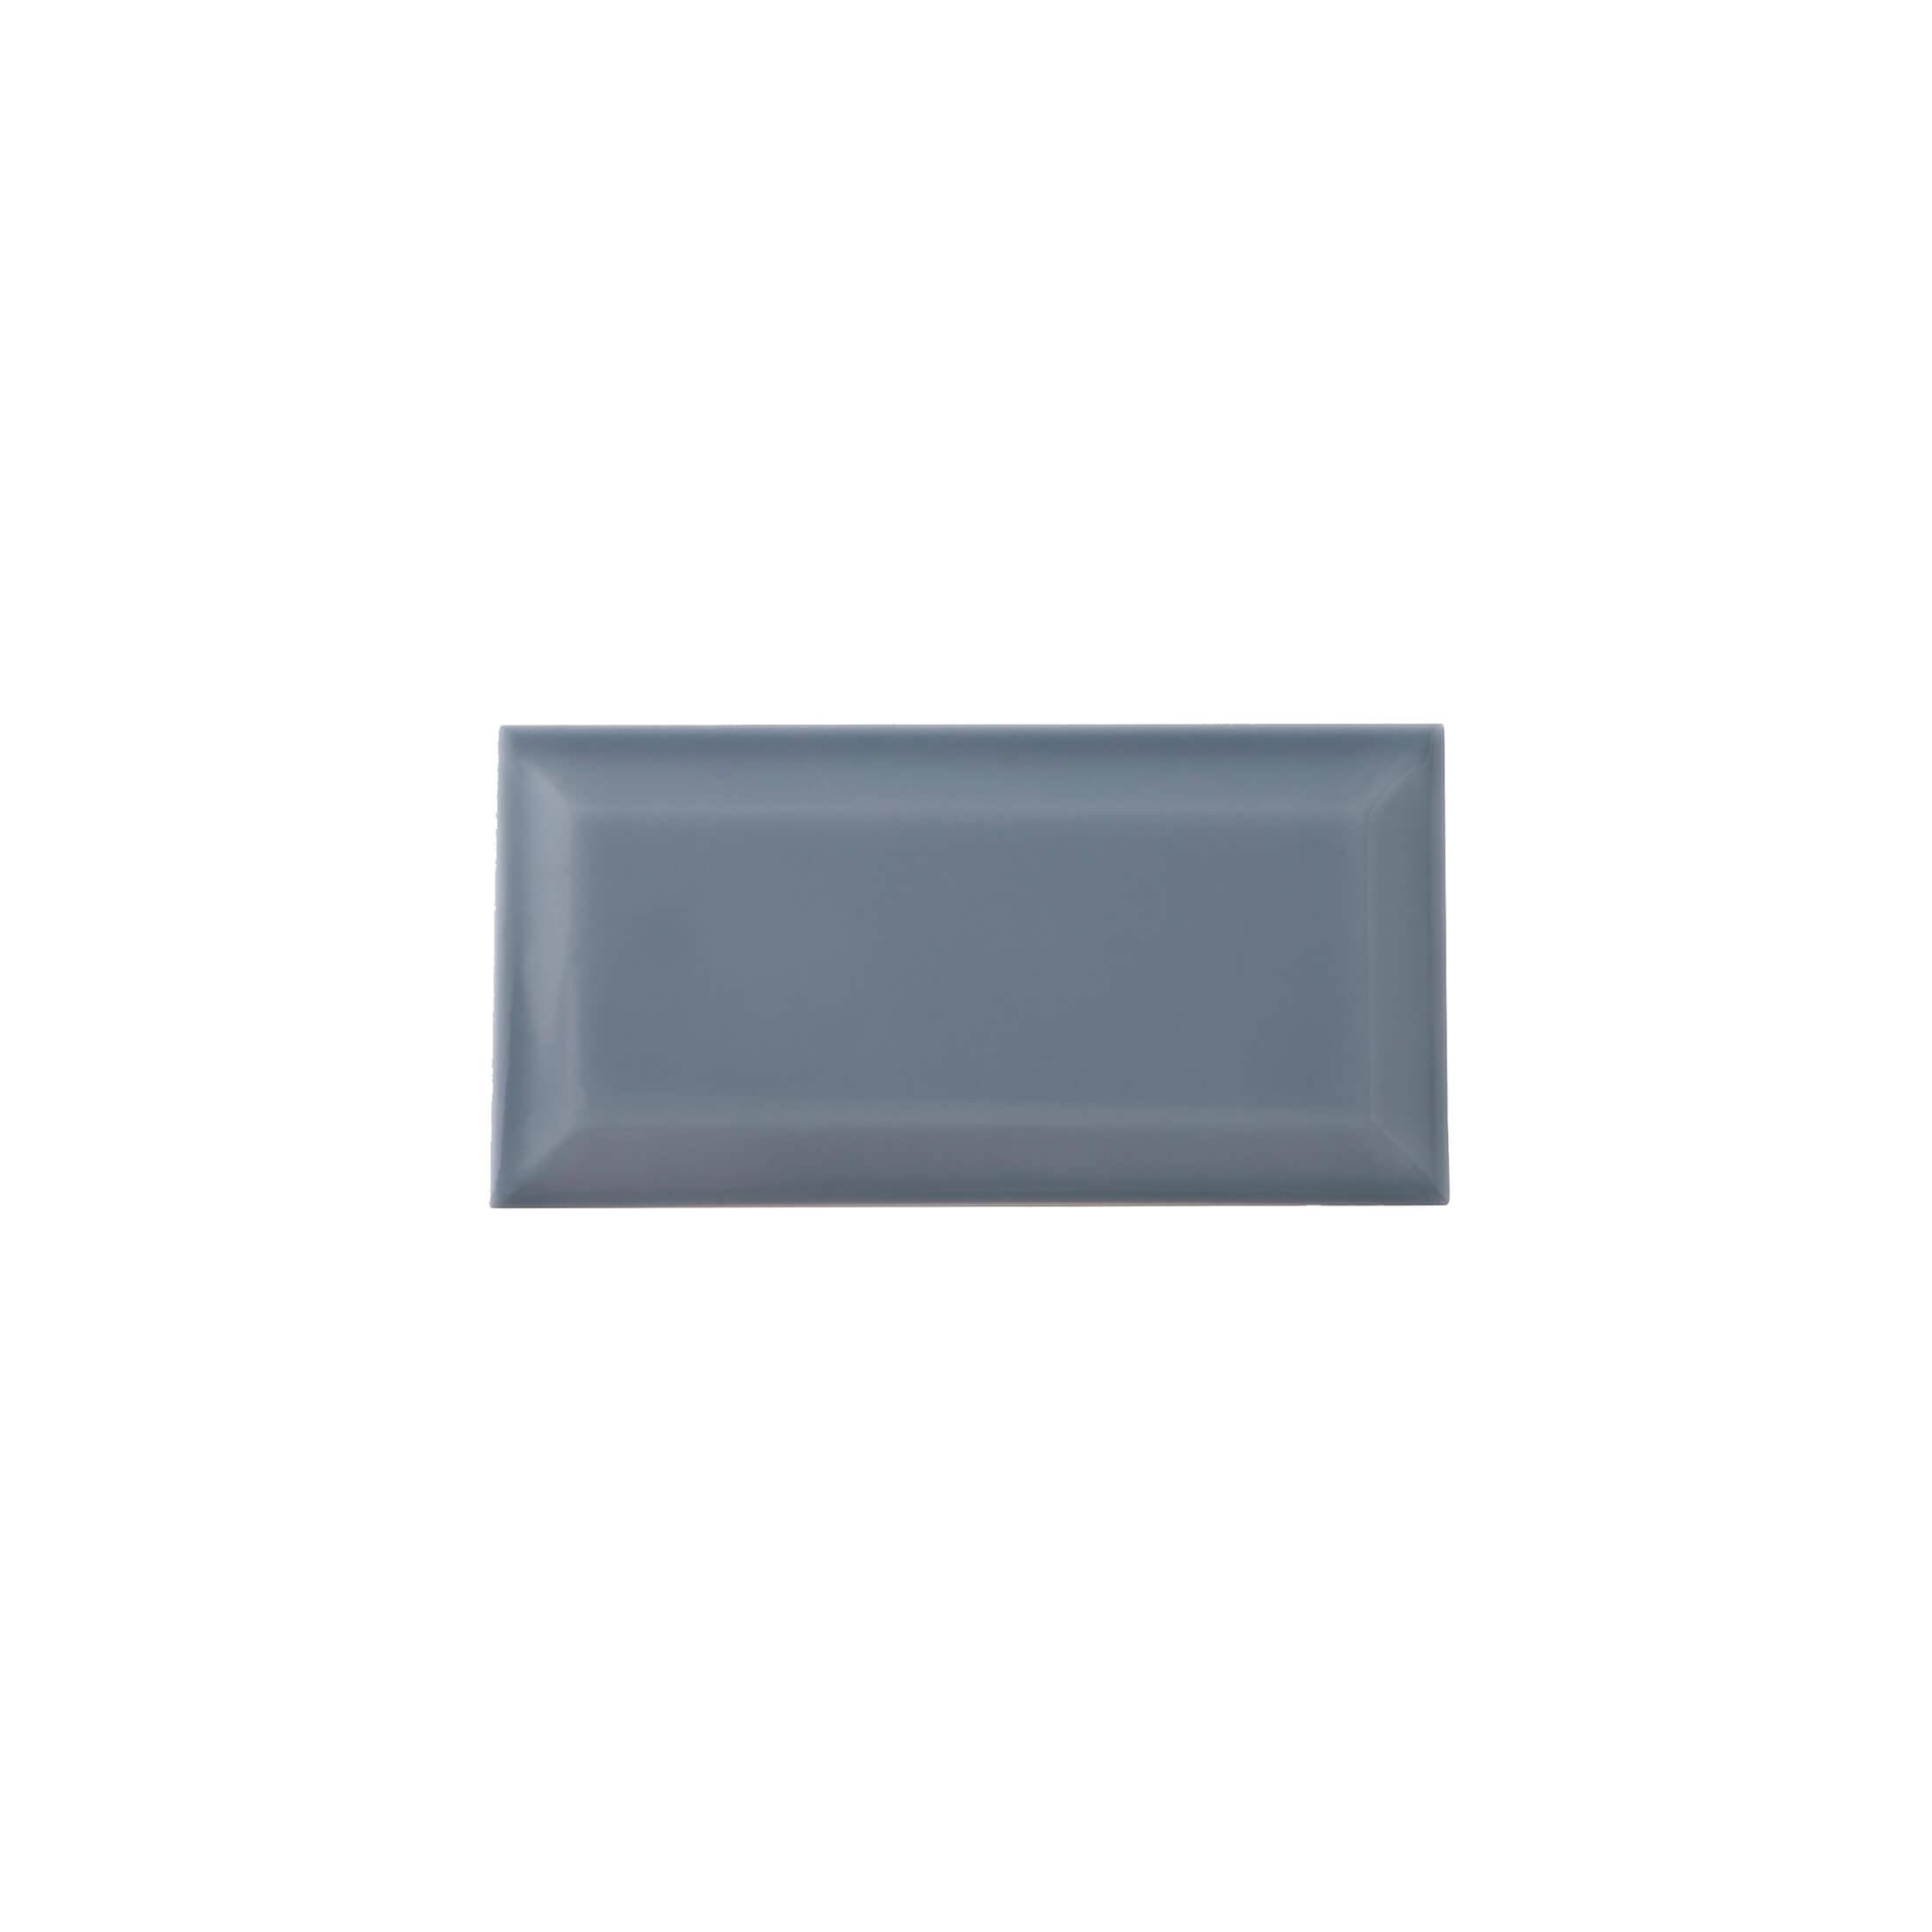 ADNE2054 - BISELADO PB - 7.5 cm X 15 cm